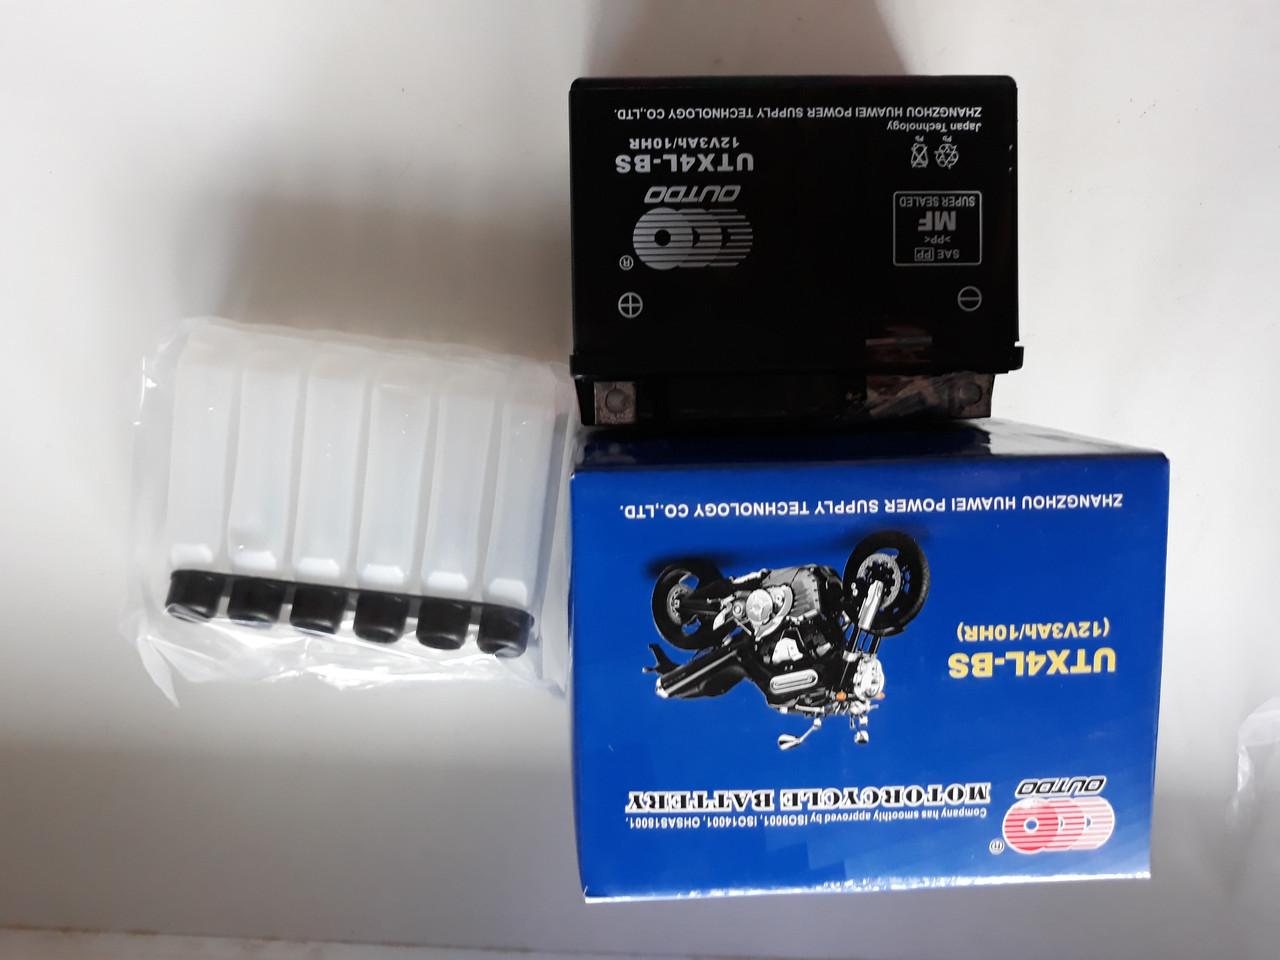 Акумулятор кислотний 115-70-85mm 12V 4A Delta Дельта